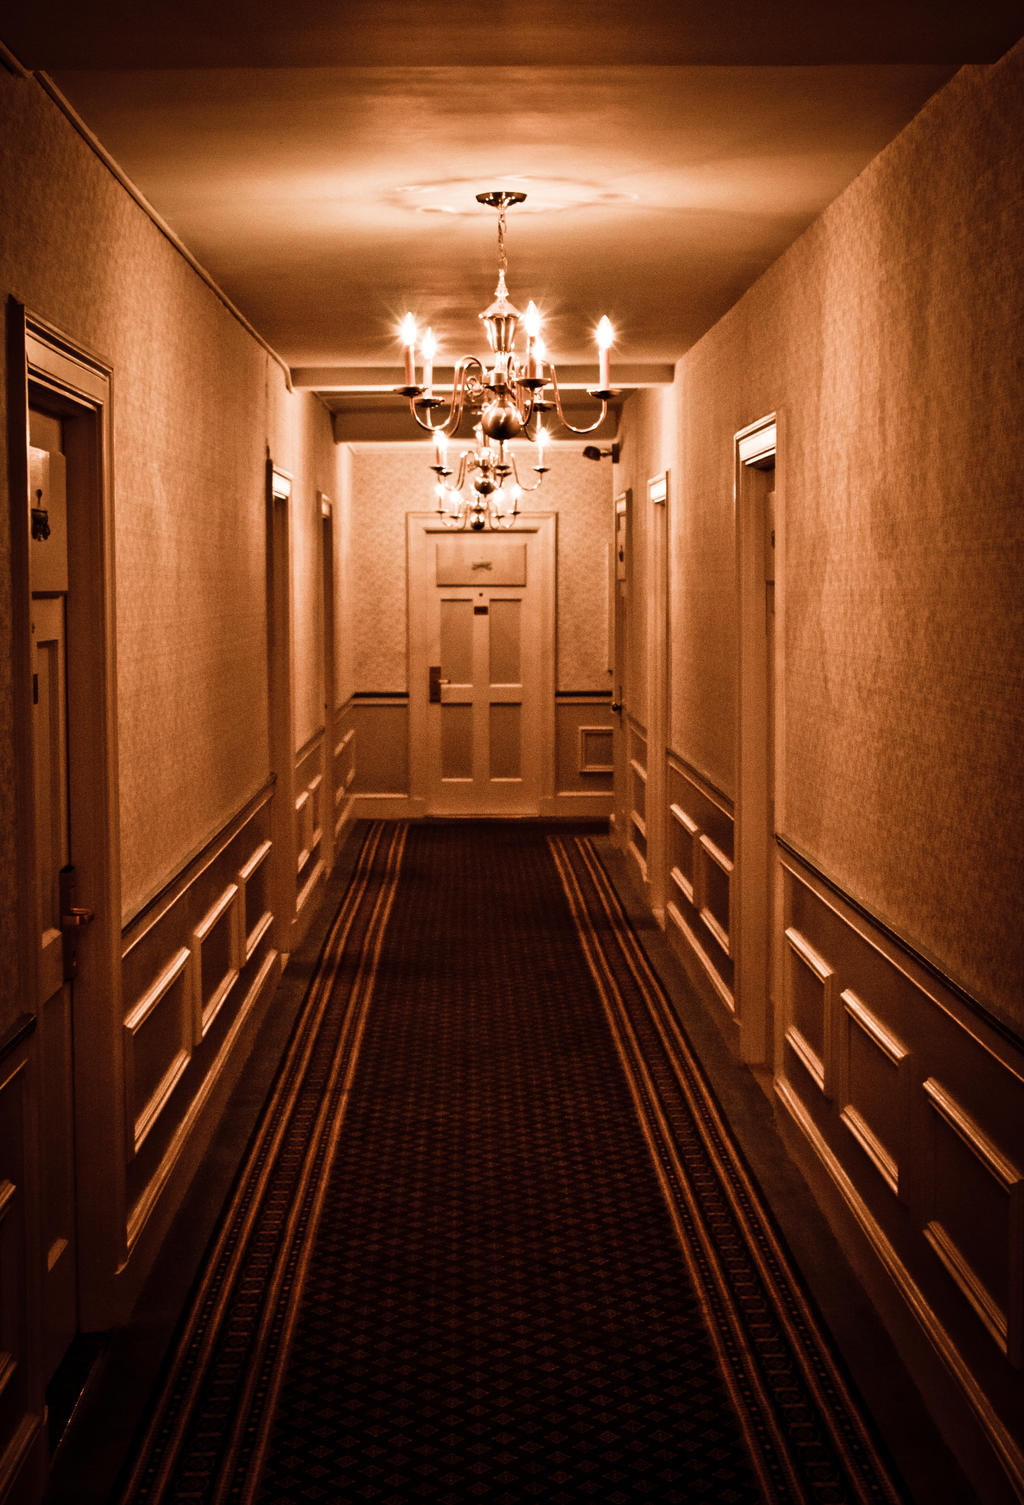 Haunted hallway by hjoranna on deviantart for Haunted house hallway ideas